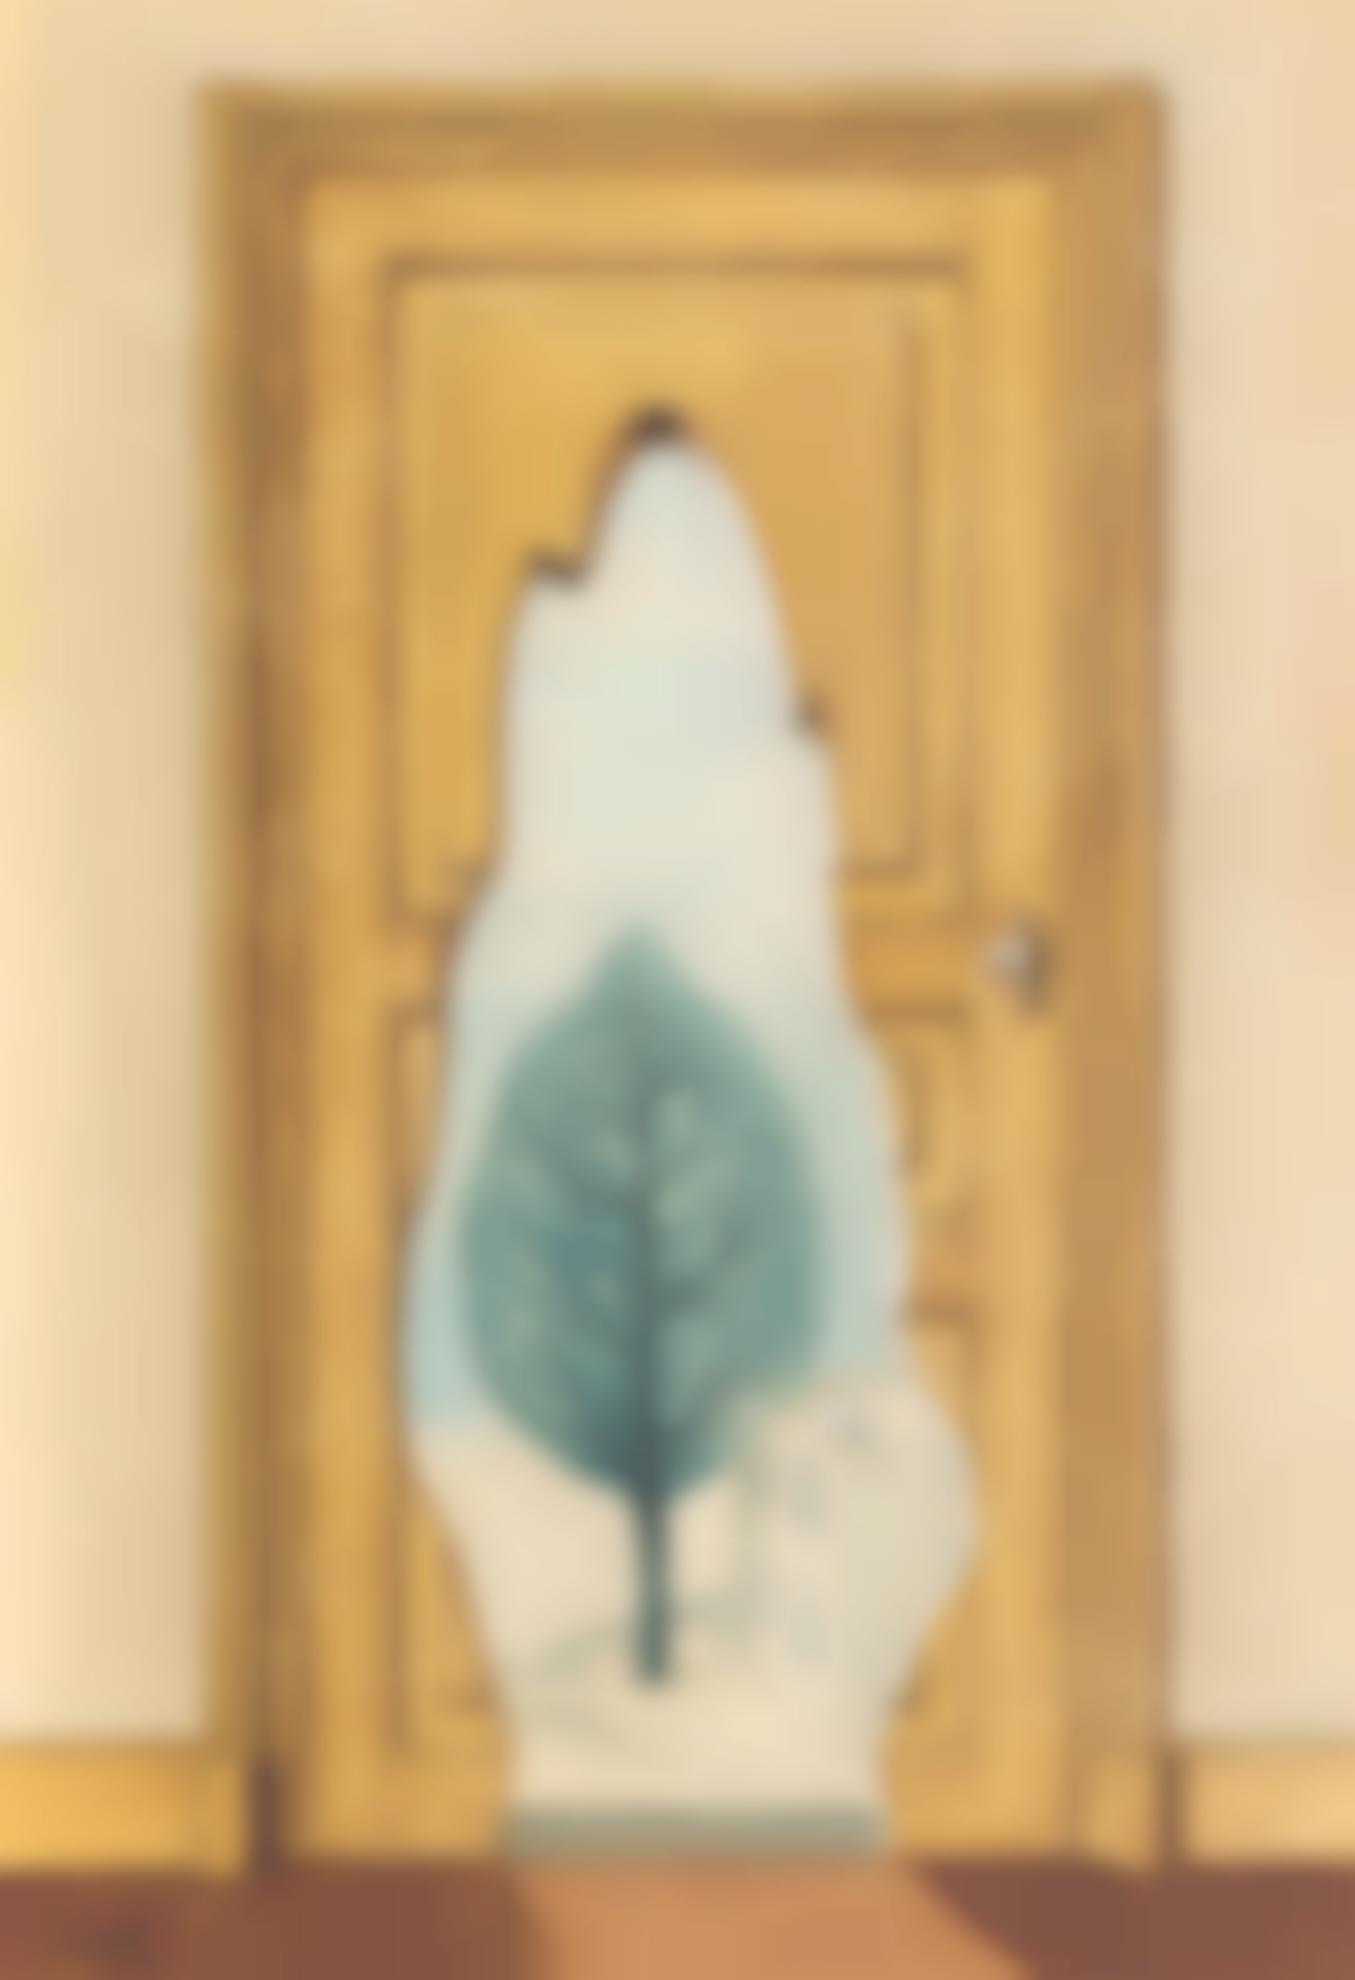 Rene Magritte-La Perspective Amoureuse-1936